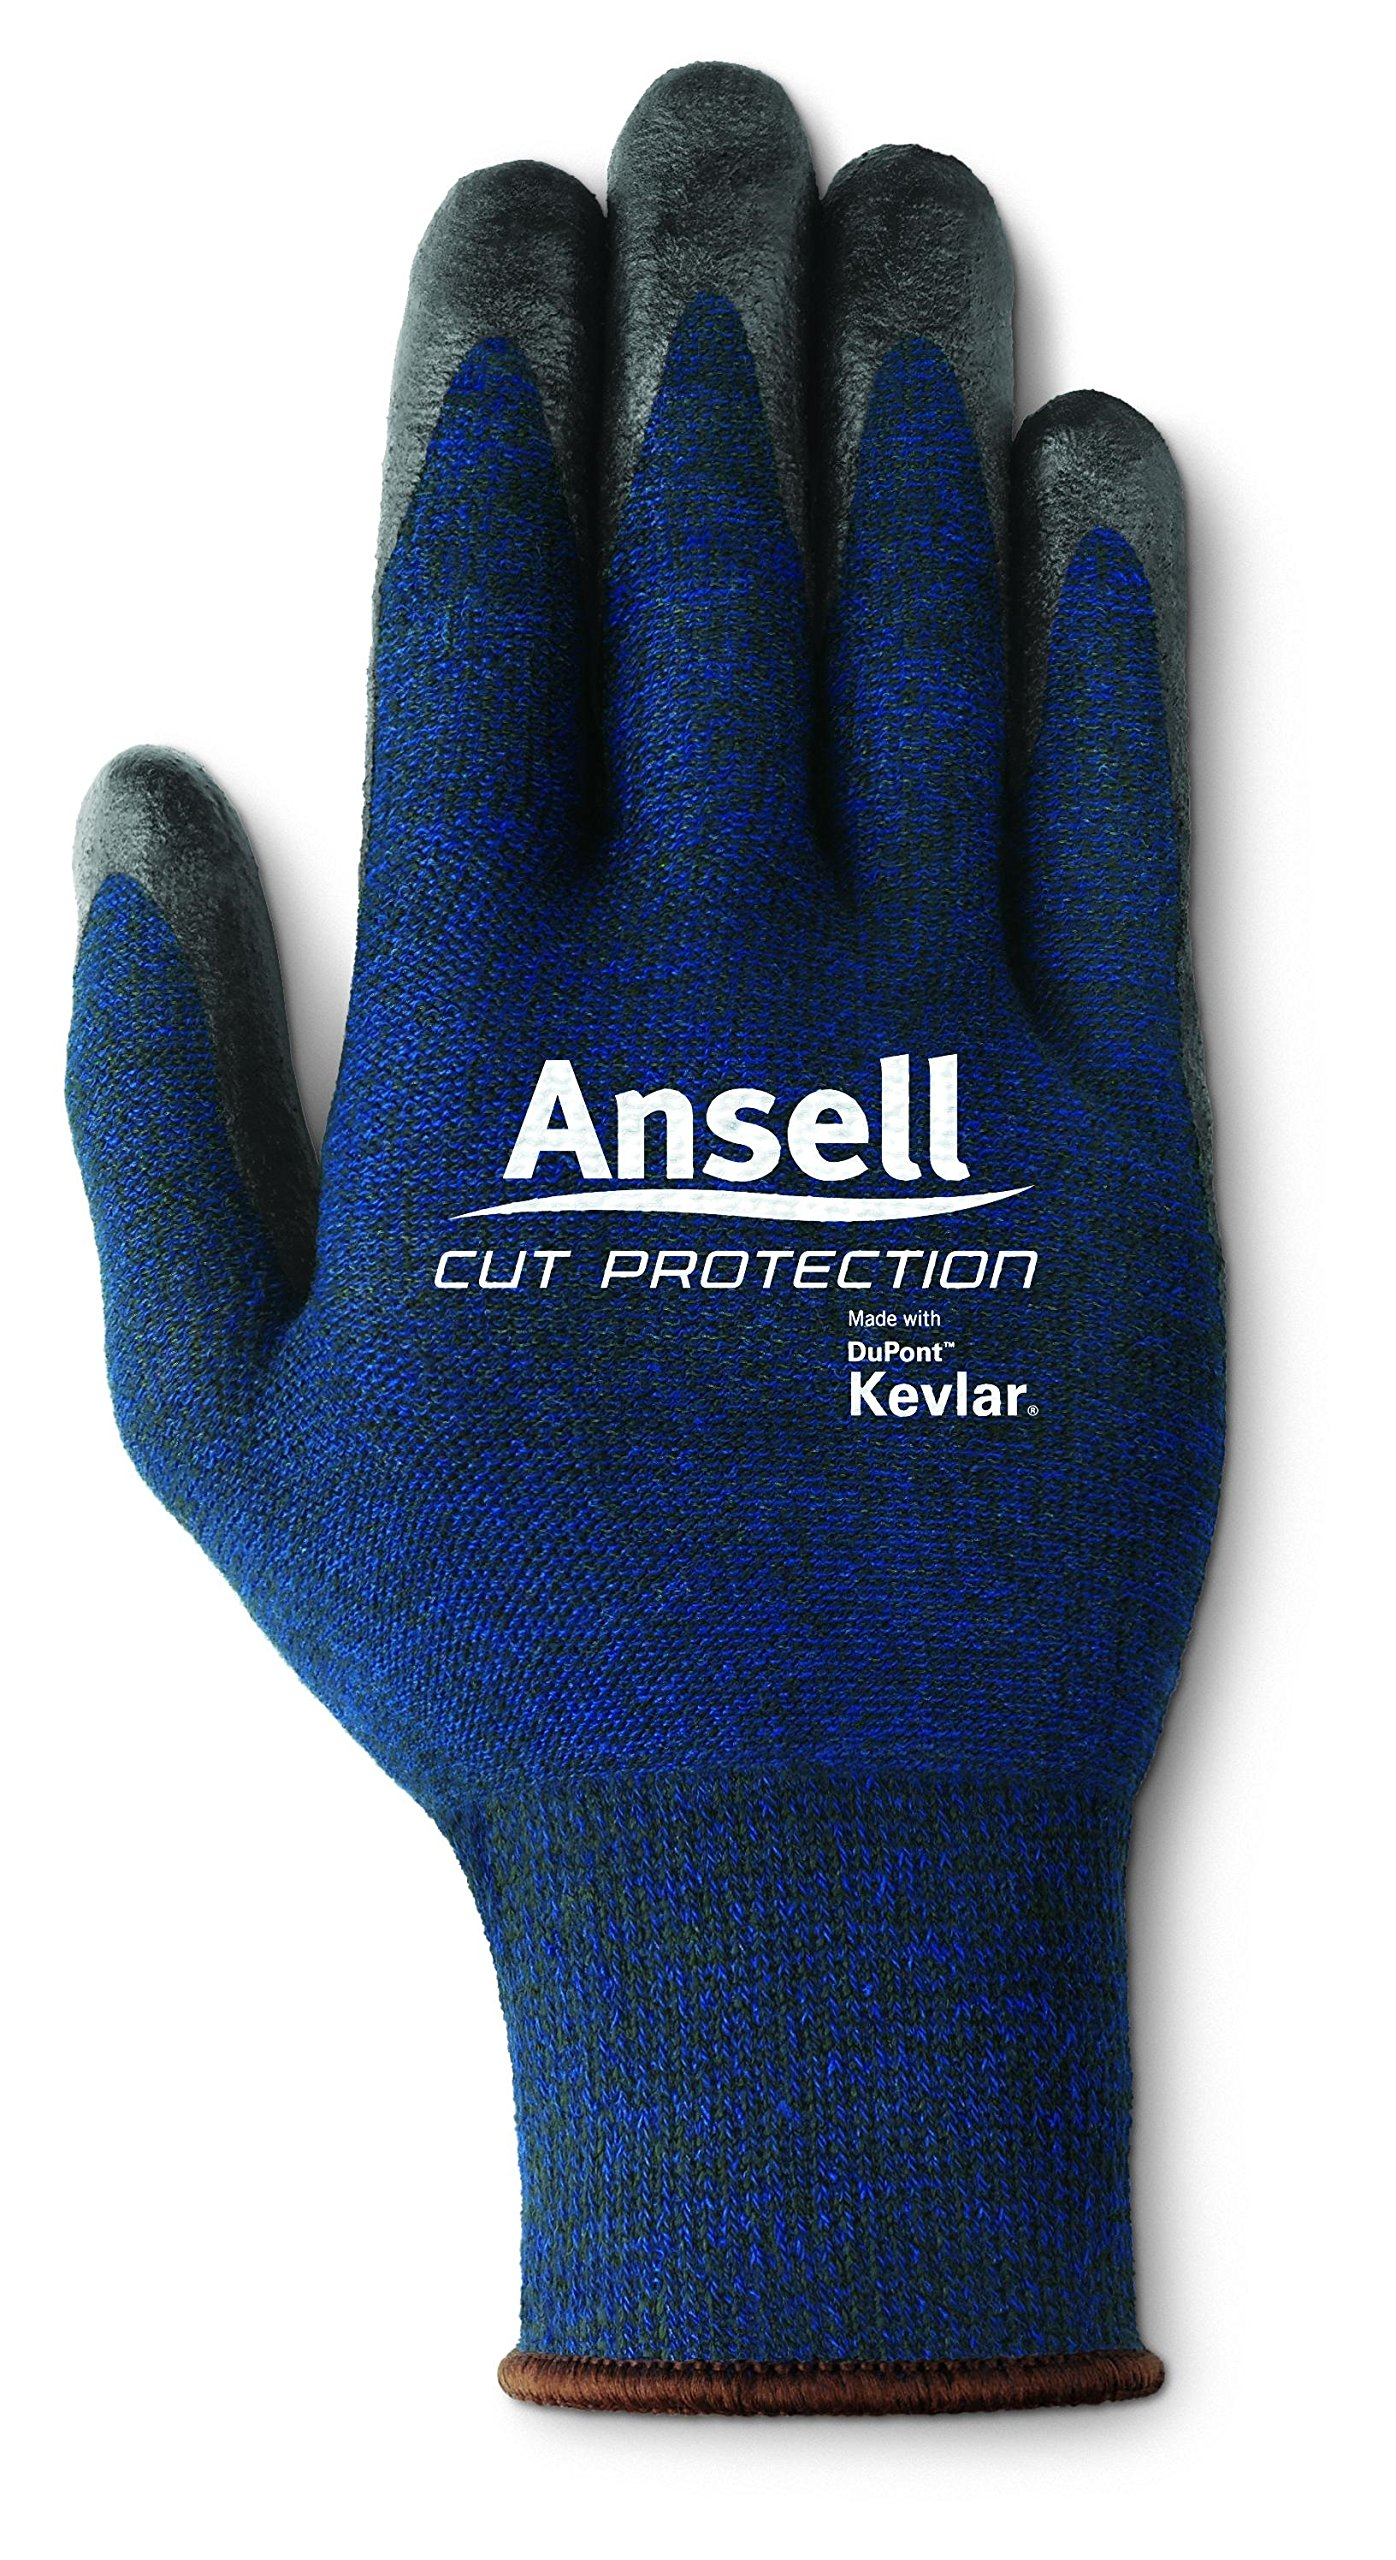 Ansell Cut Protection 97-505 Kevlar Glove, Cut Resistant, Black Foam Nitrile Coating, Knit Wrist Cuff, Medium (Pack of 1)